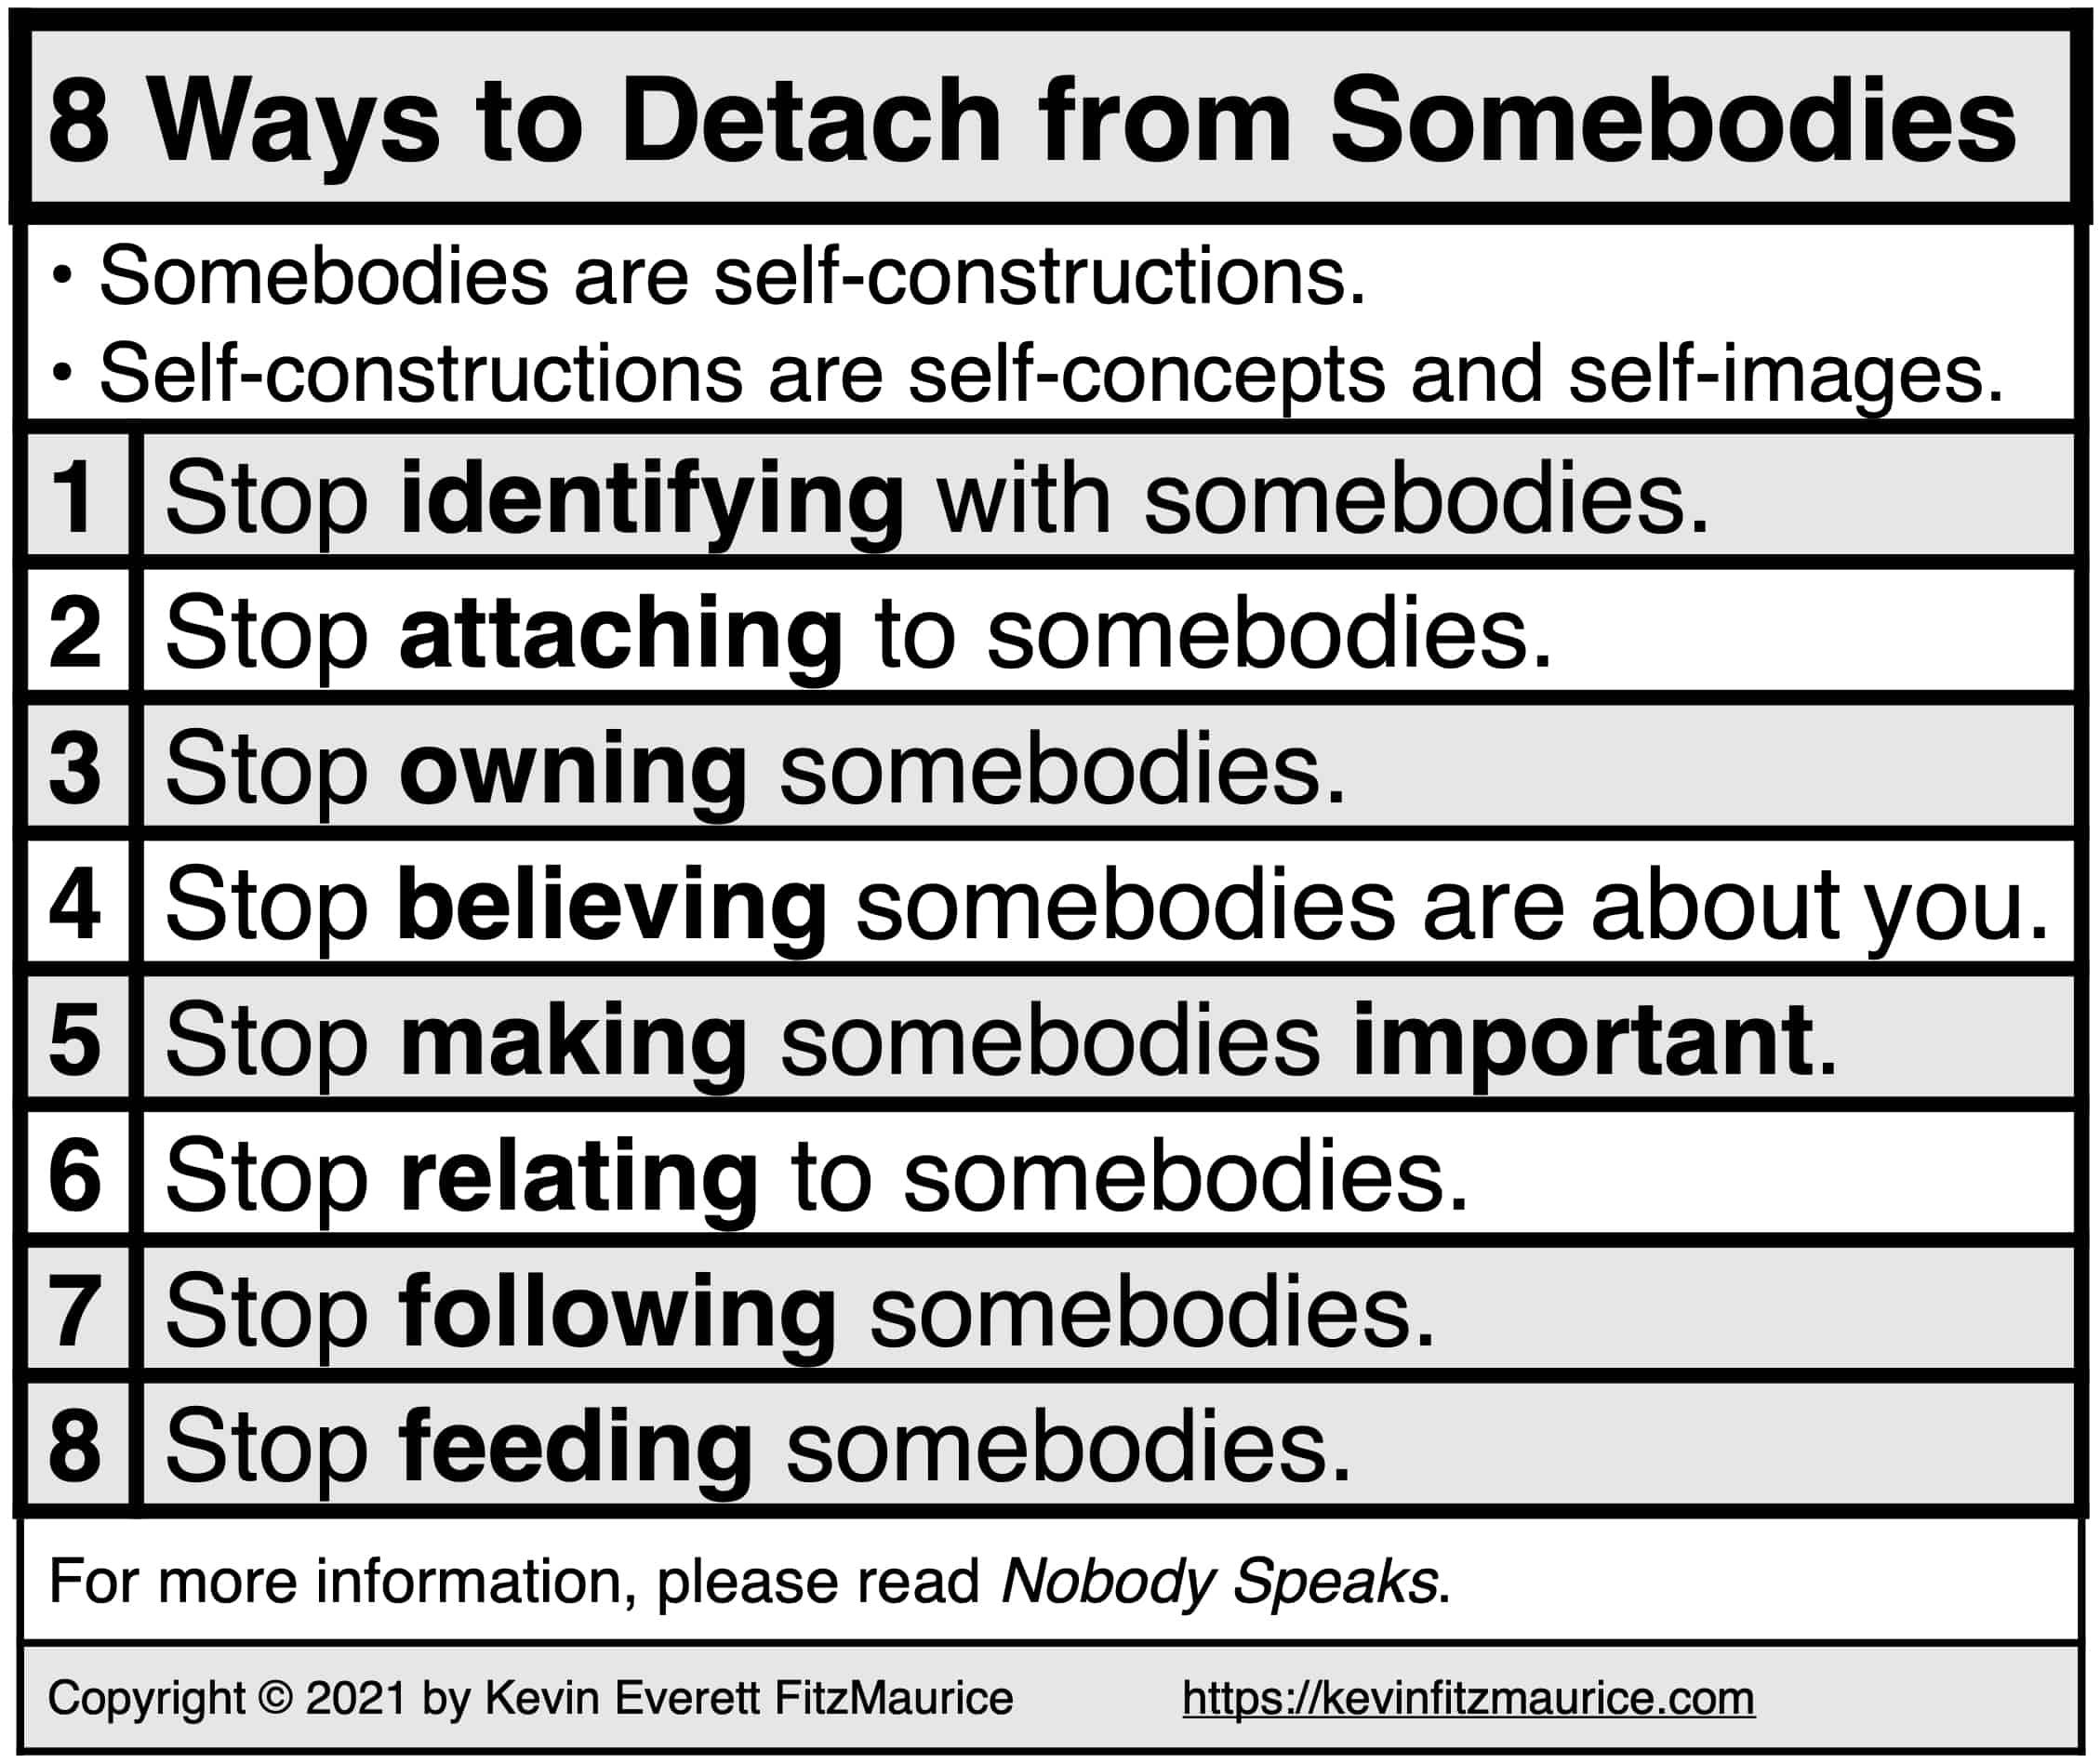 8 Ways to Detach from Somebodies